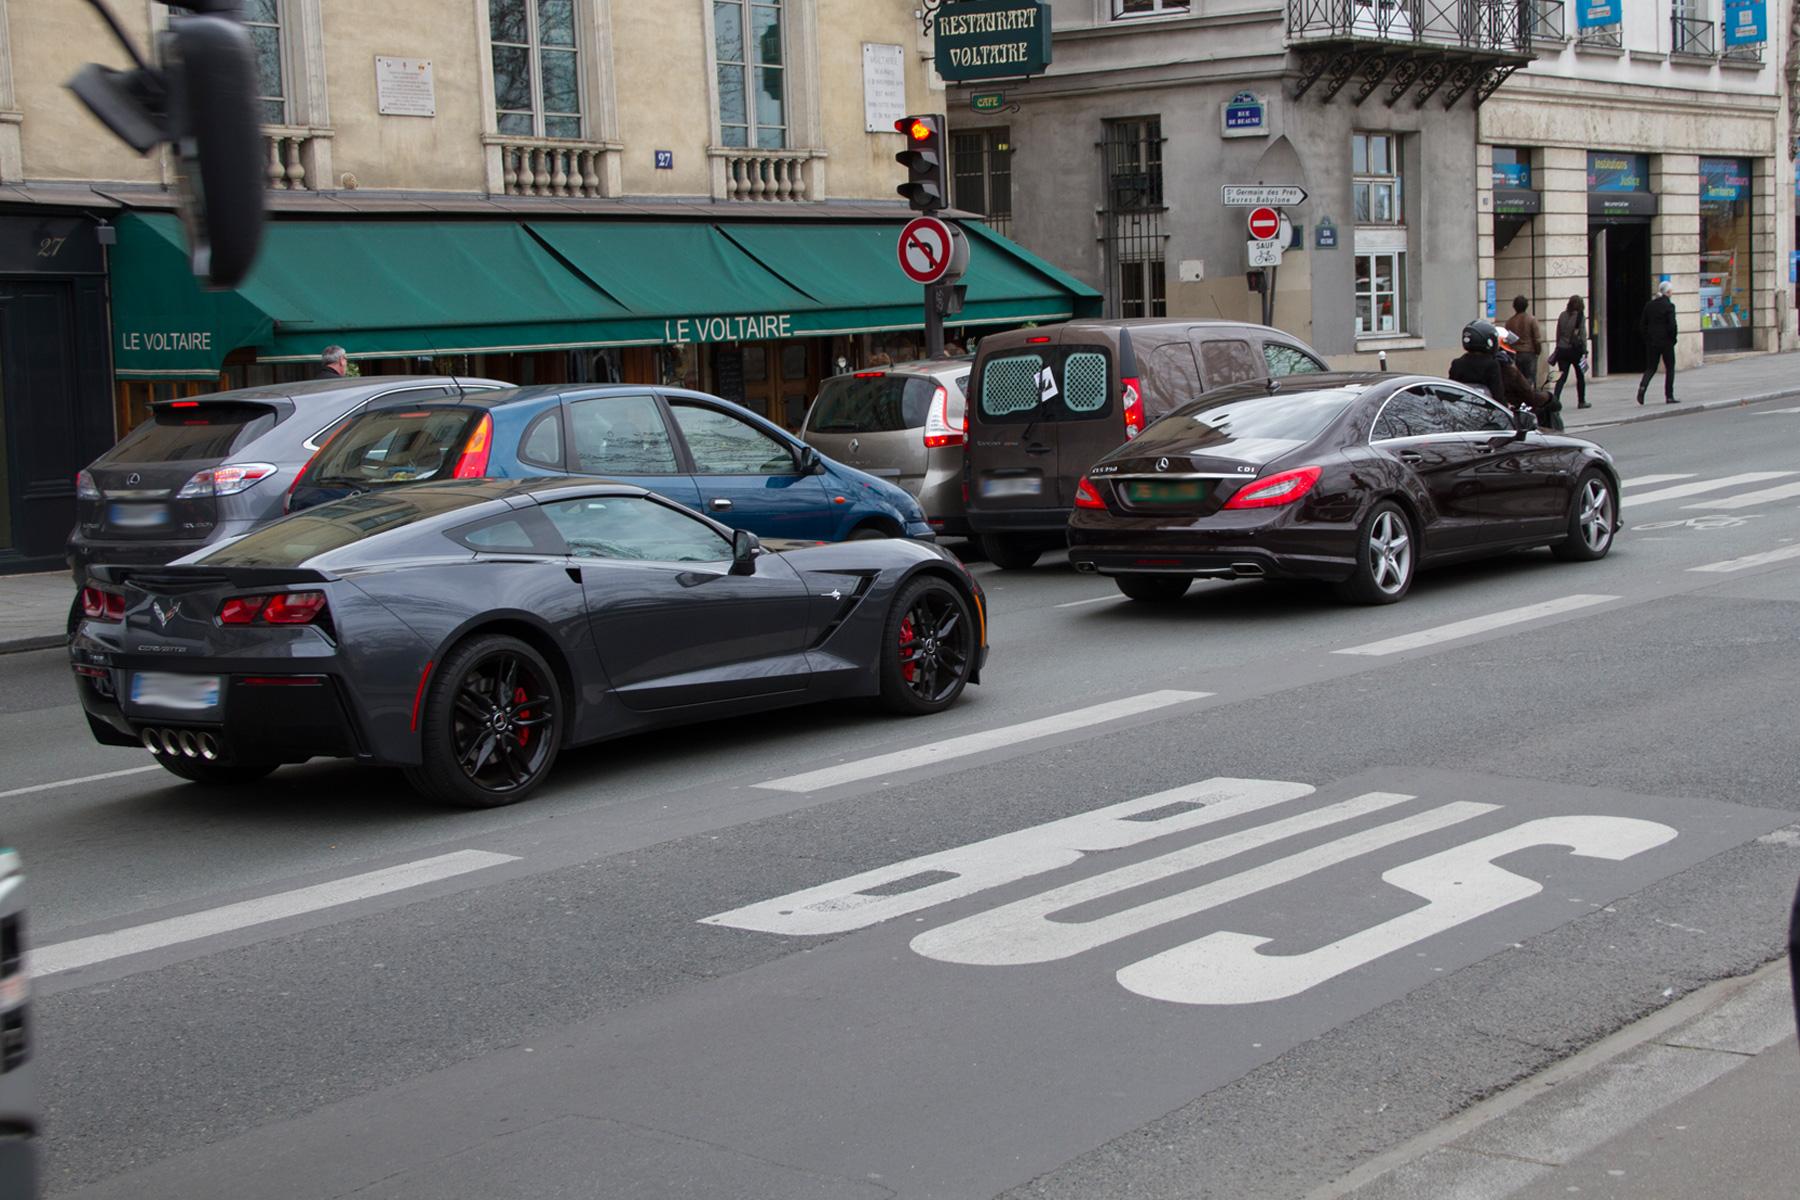 cars-paris-before.jpg